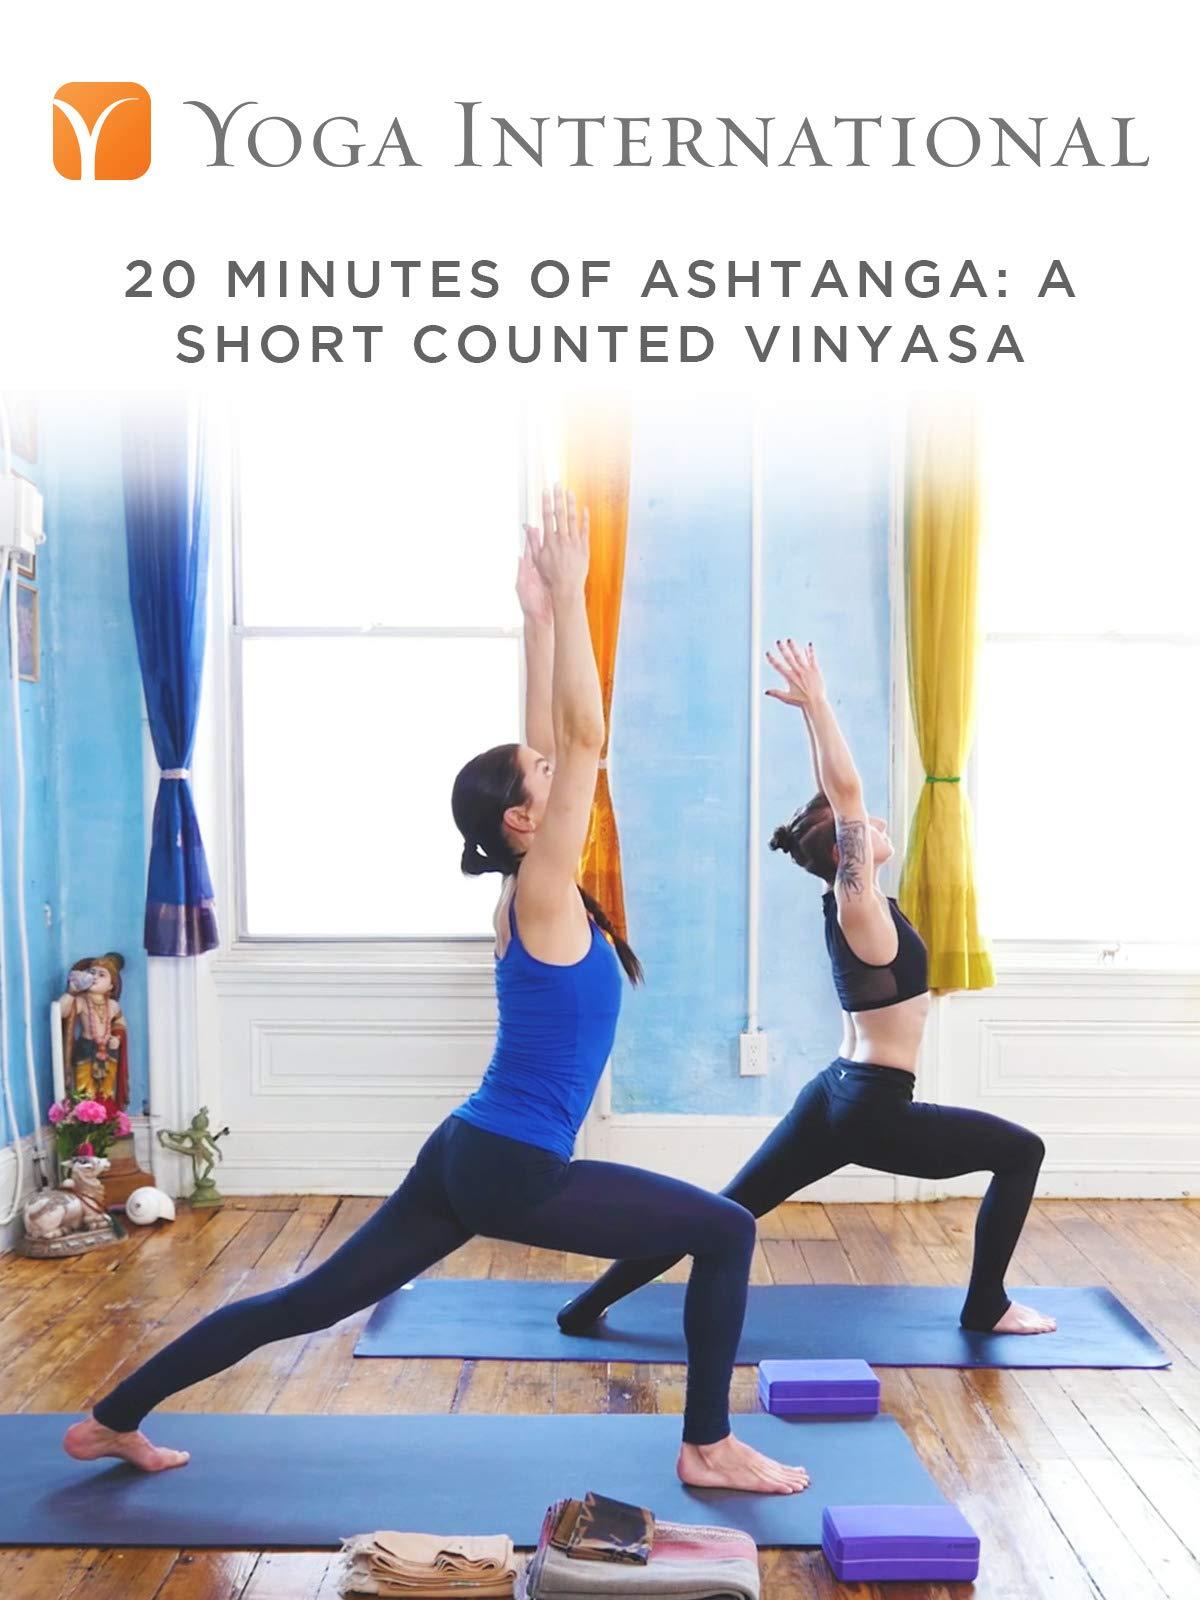 20 Minutes of Ashtanga: A Short Counted Vinyasa